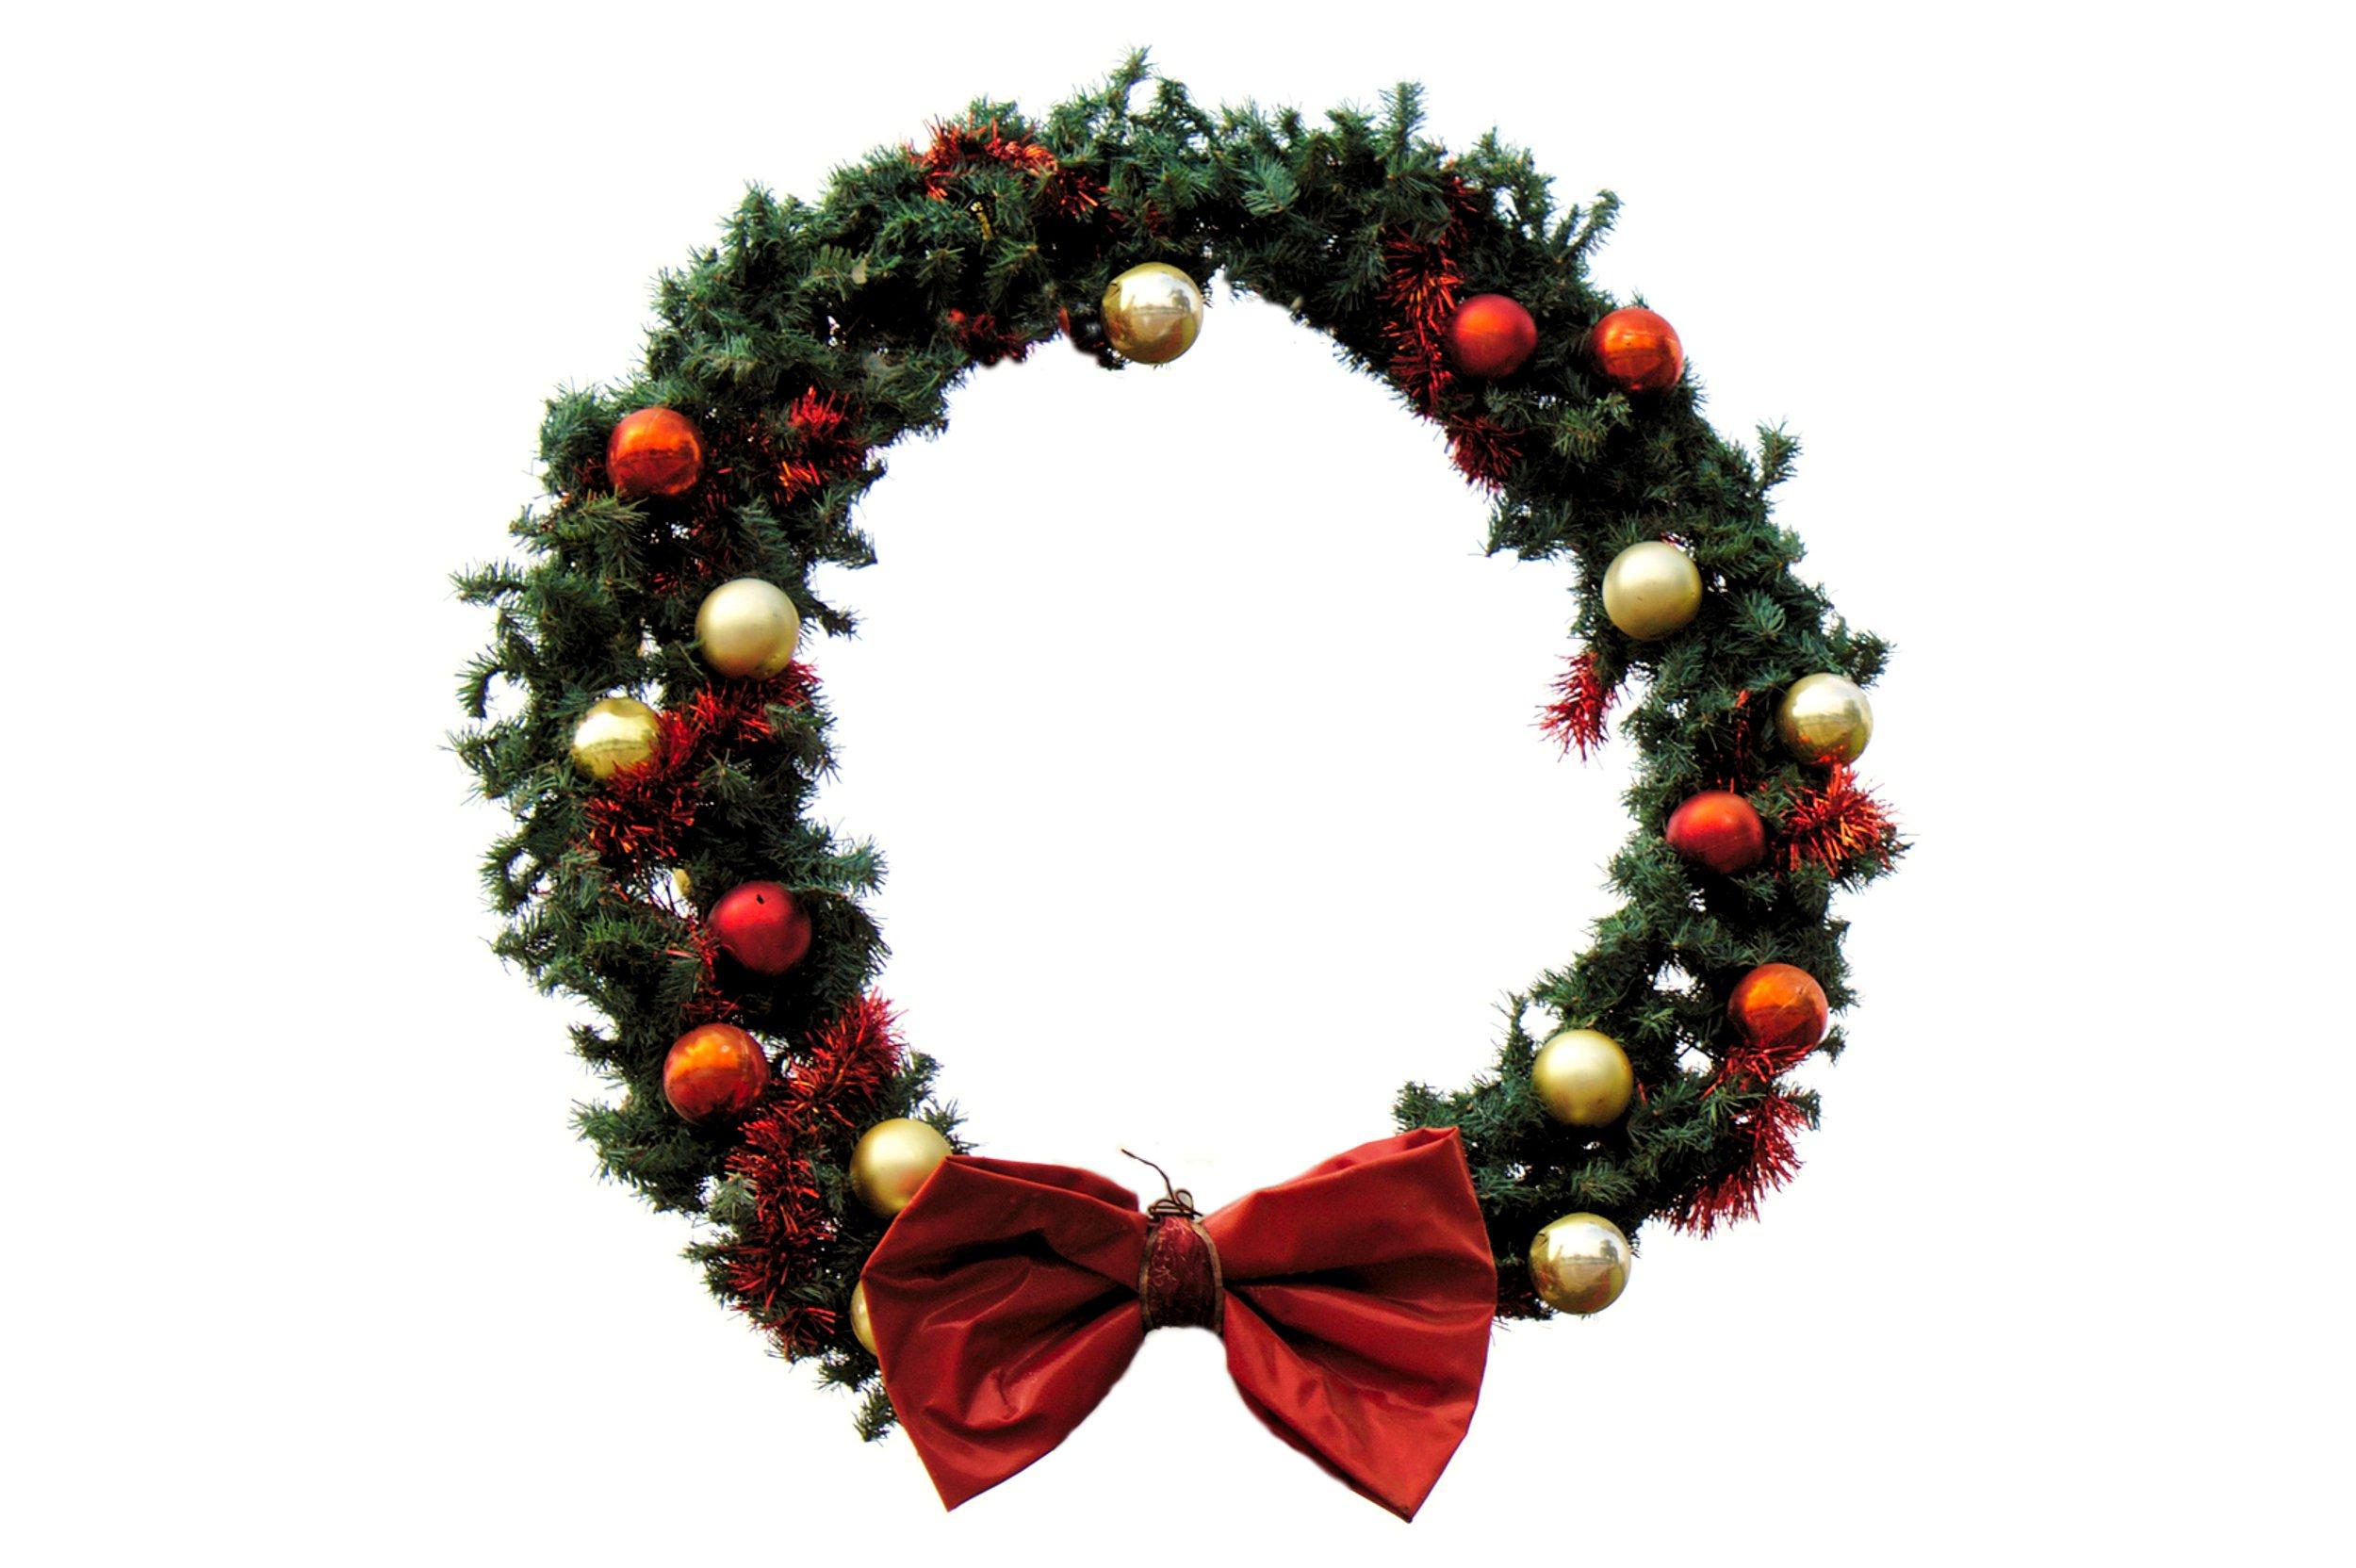 Free photo: Christmas wreath on white background - Ring, Round ...